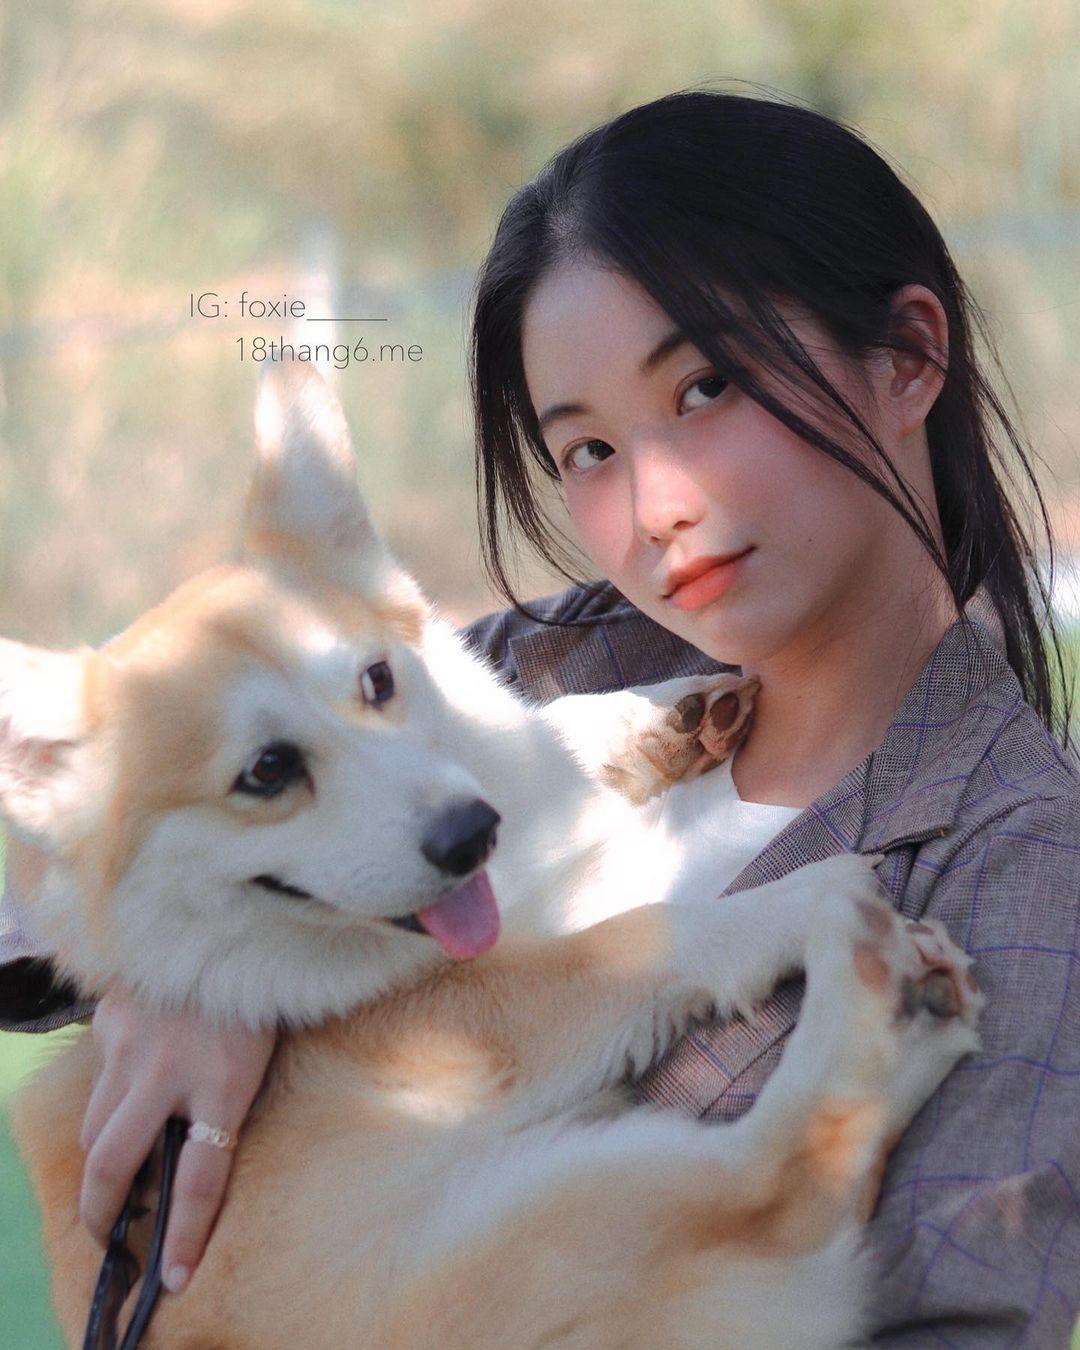 无敌妹子-白嫩越南学生妹子Kim Anh Nguy?n清纯可爱